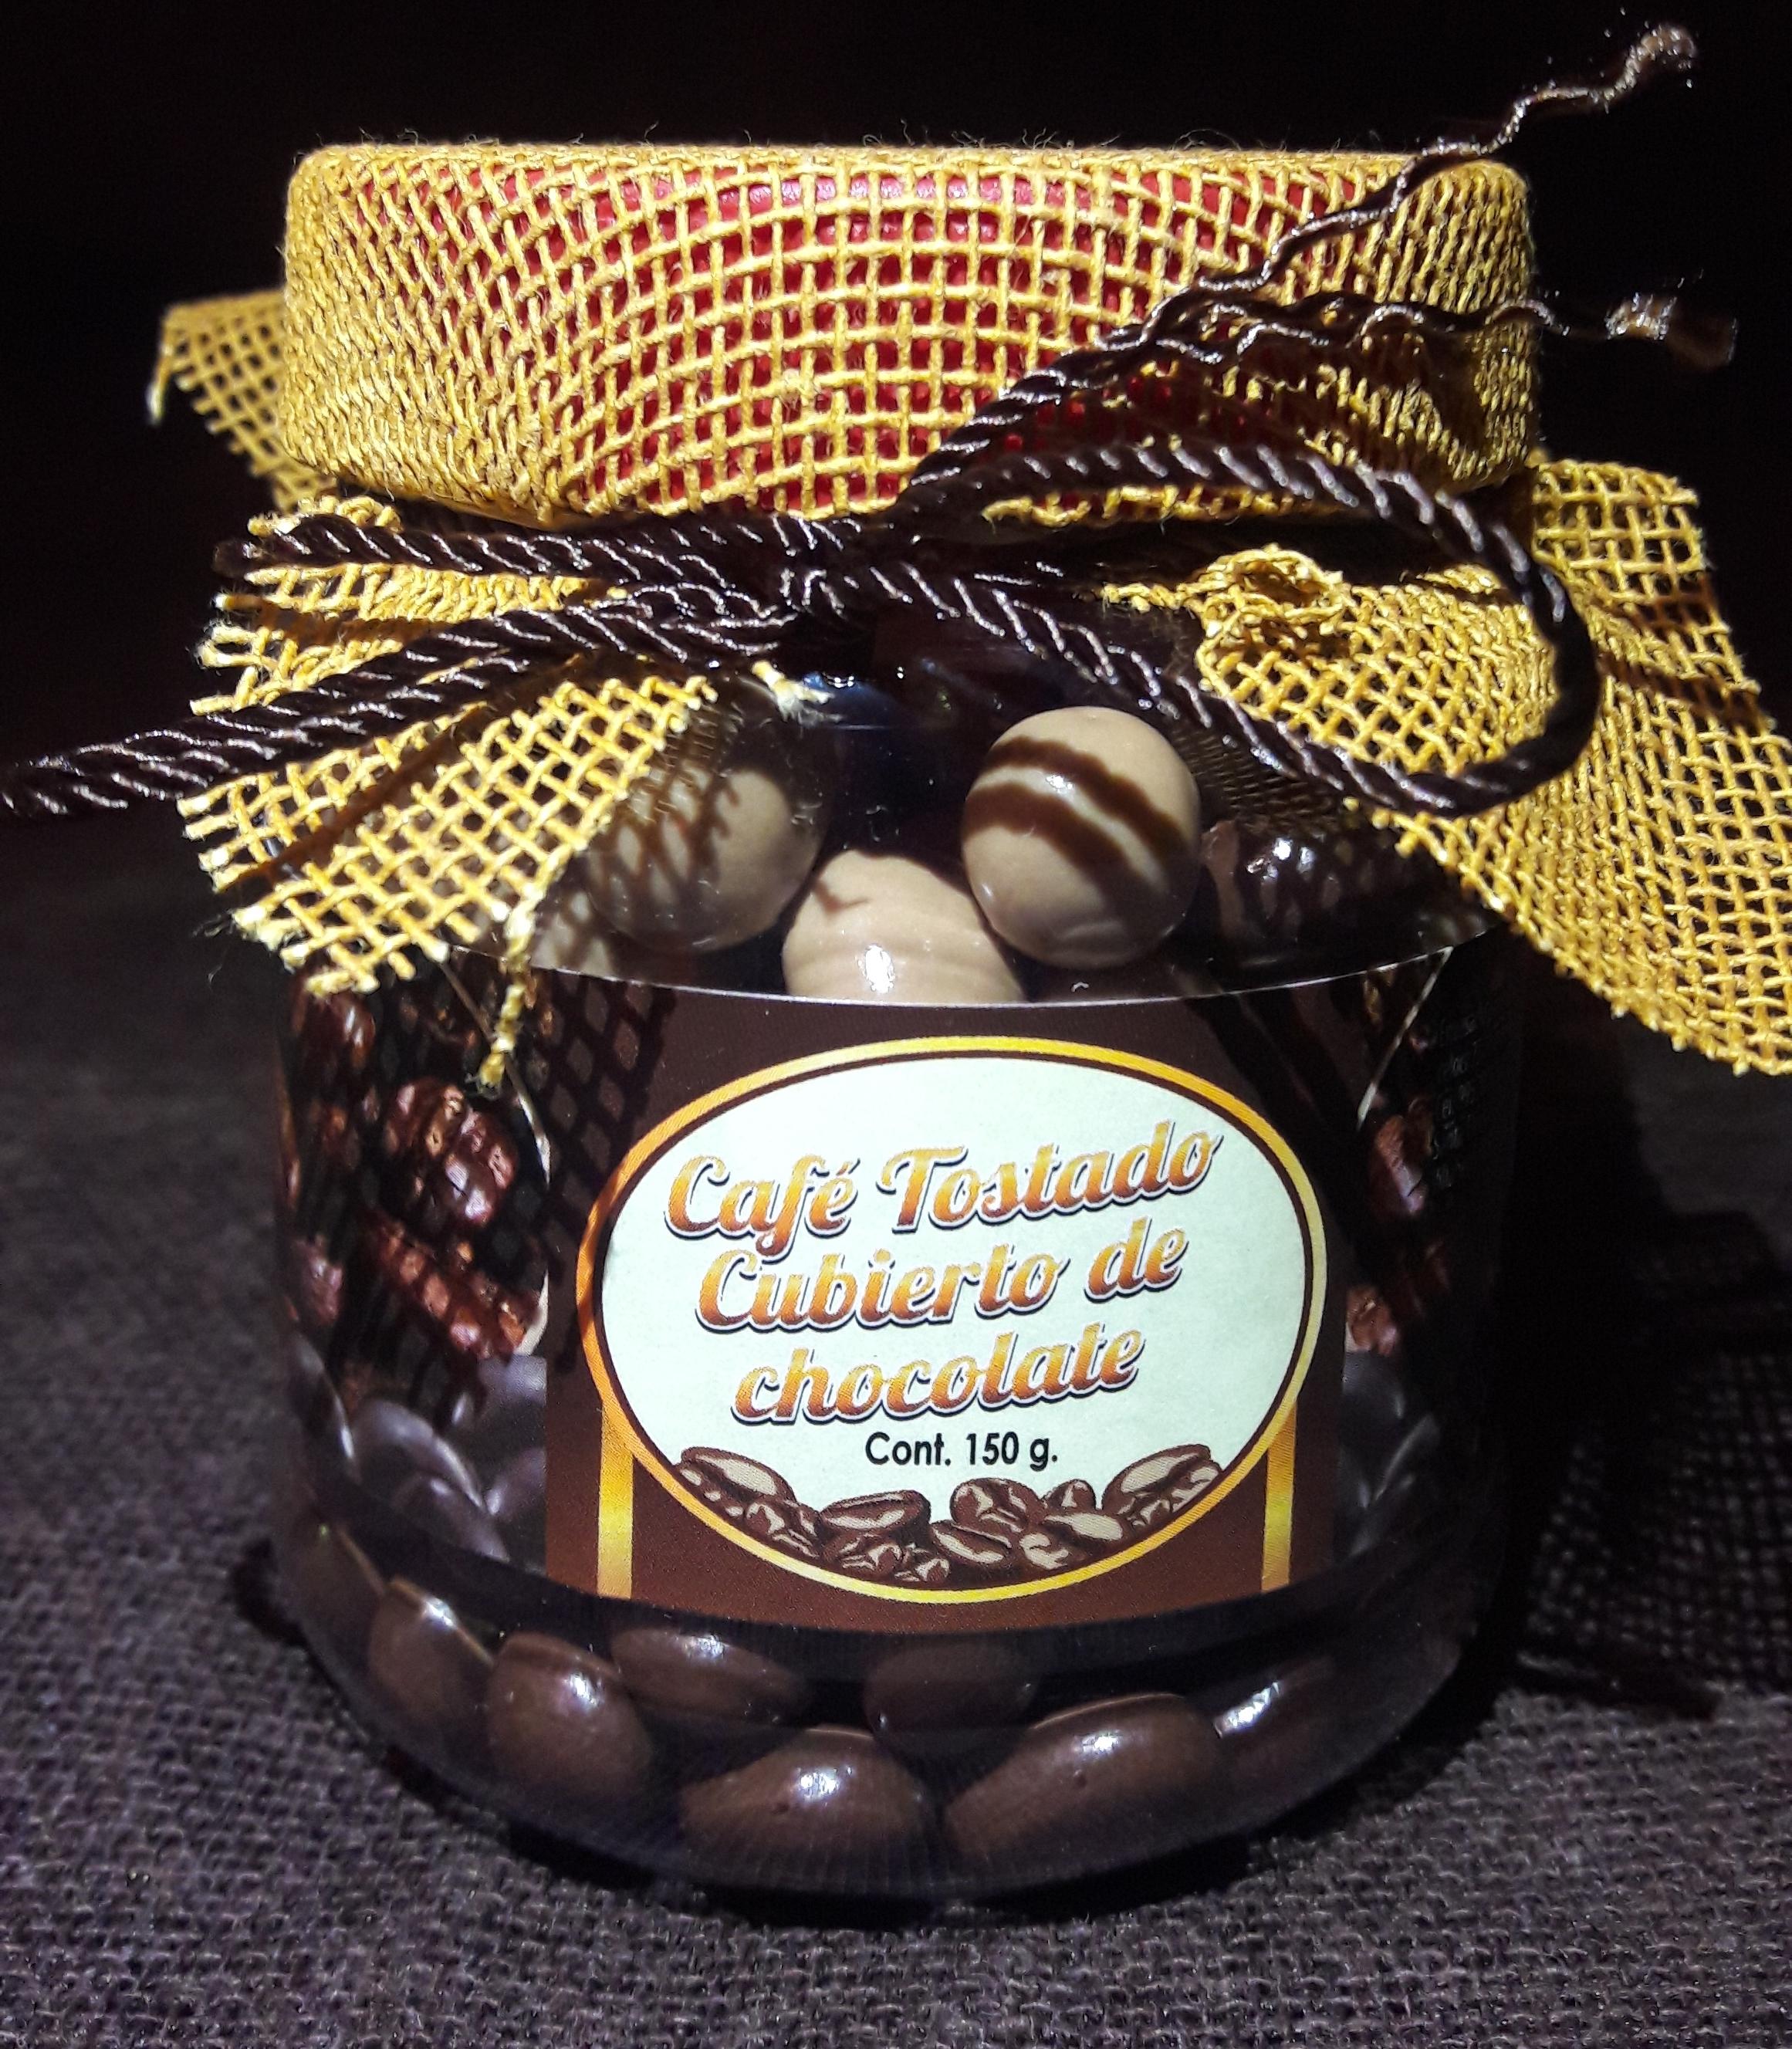 Grano de café tostado cubierto de chocolate bote con 150gr